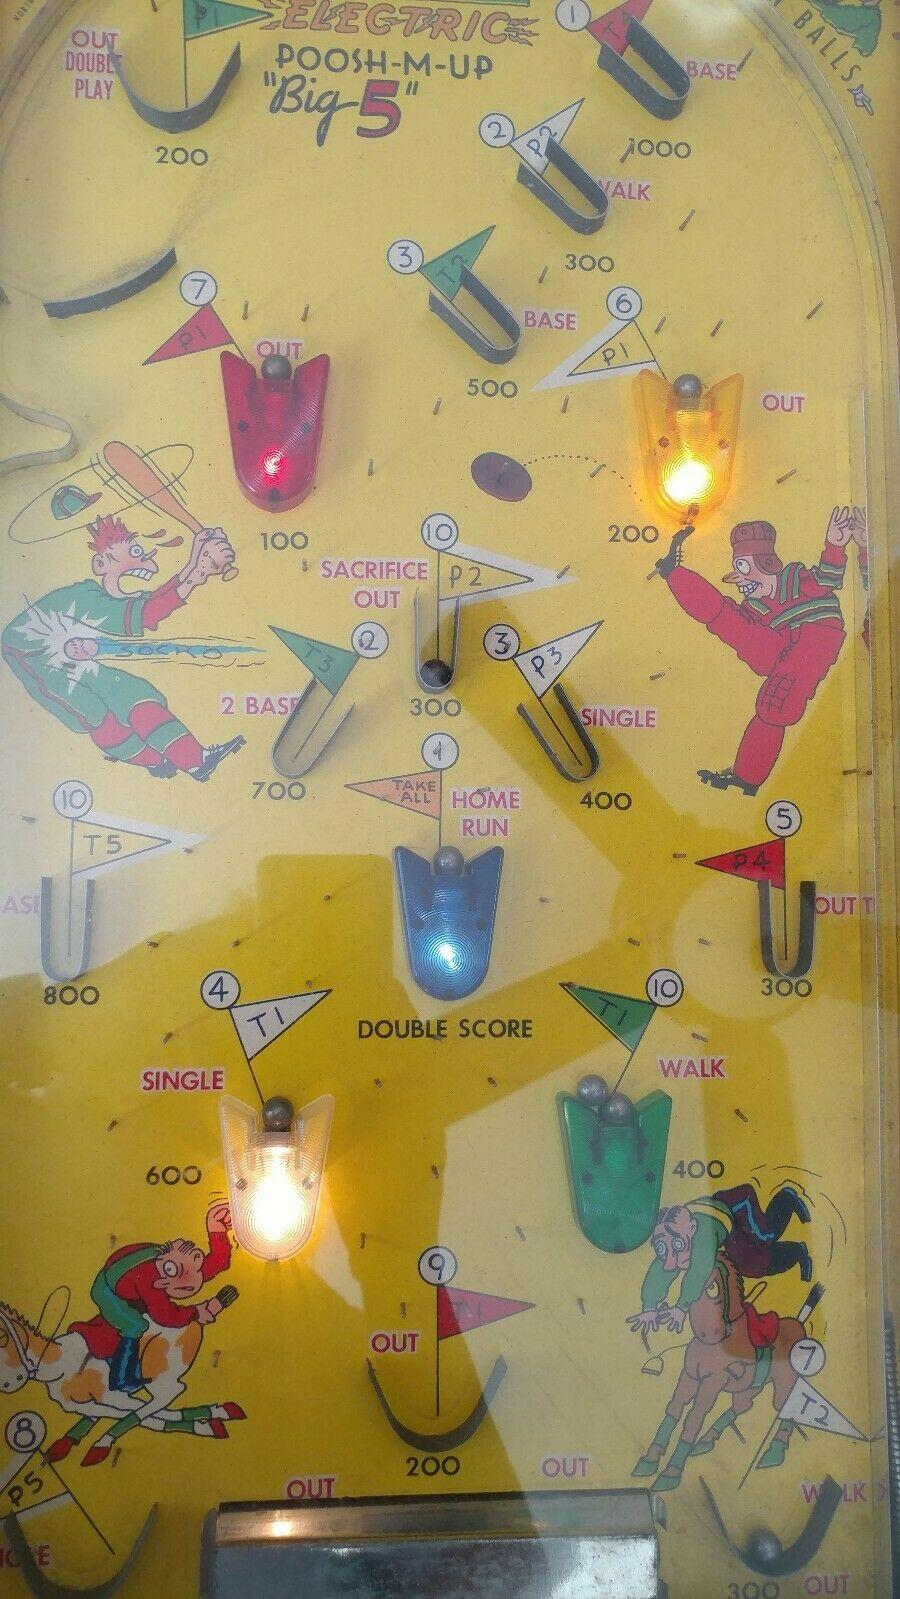 Vintage Toy Board Game Pinball Poosh-M-Up Big 5 Original Box Instructions WORKS!